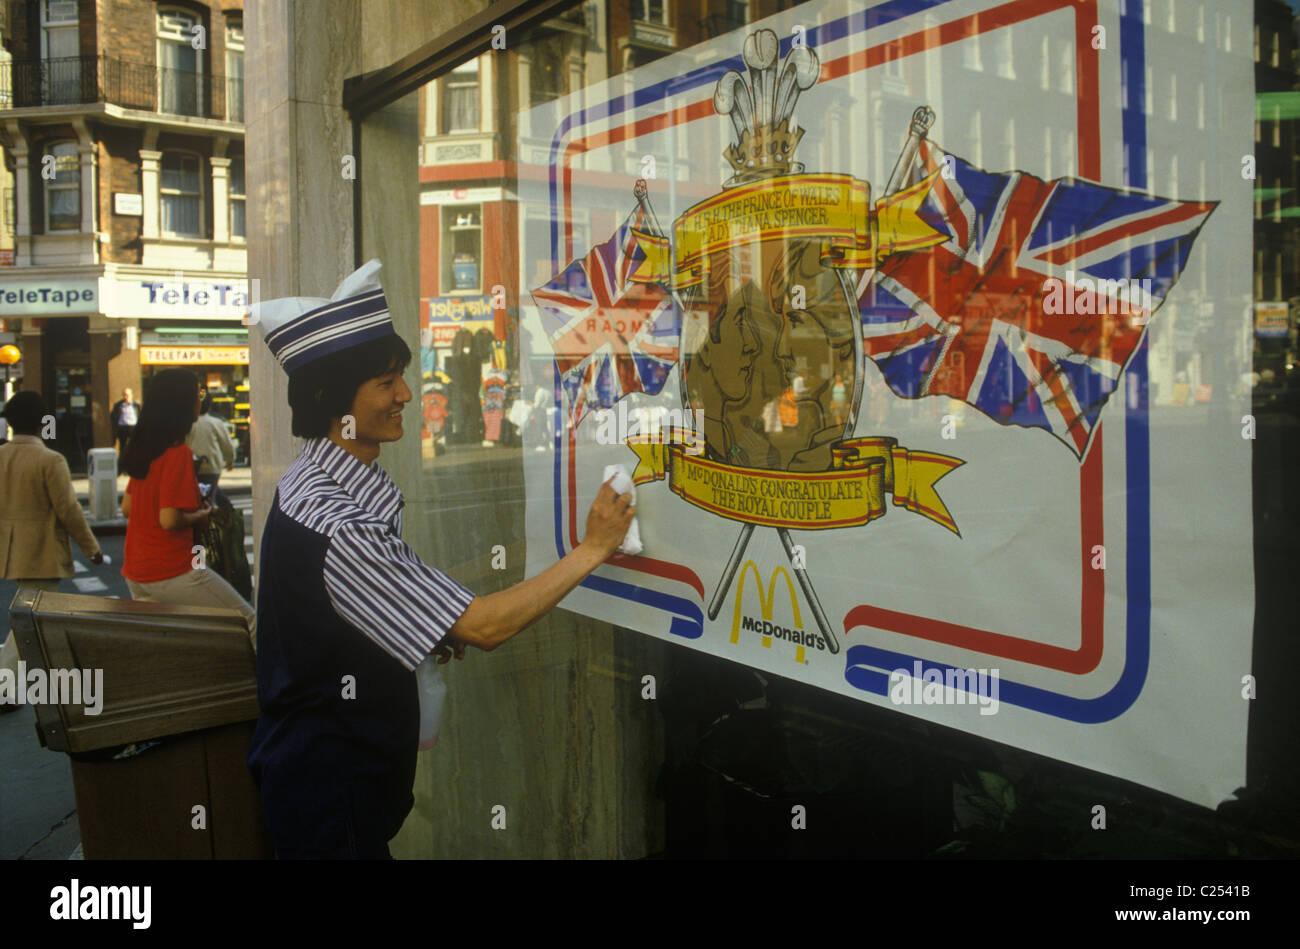 Royal Wedding Prince Charles Lady di Diana Spencer wedding poster in vetrina. Londra REGNO UNITO HOMER SYKES Immagini Stock